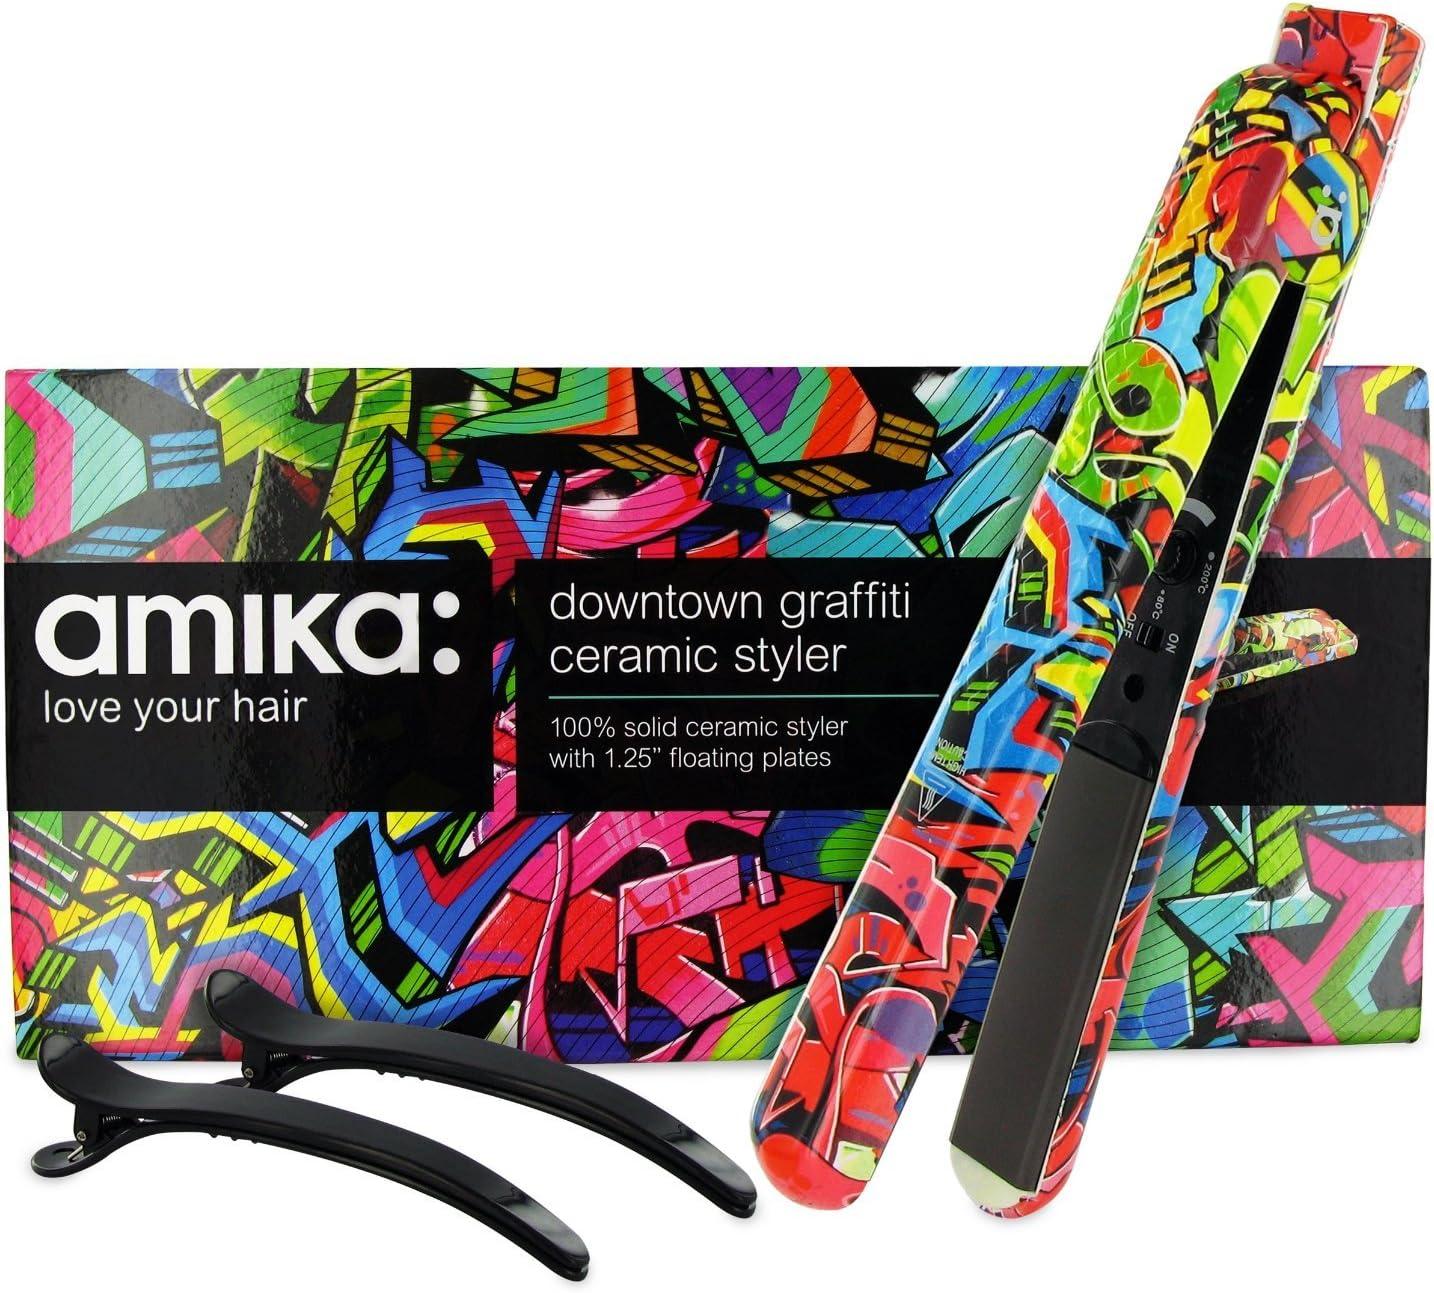 Amika Ceramic Styler Hair Straightener Graffiti